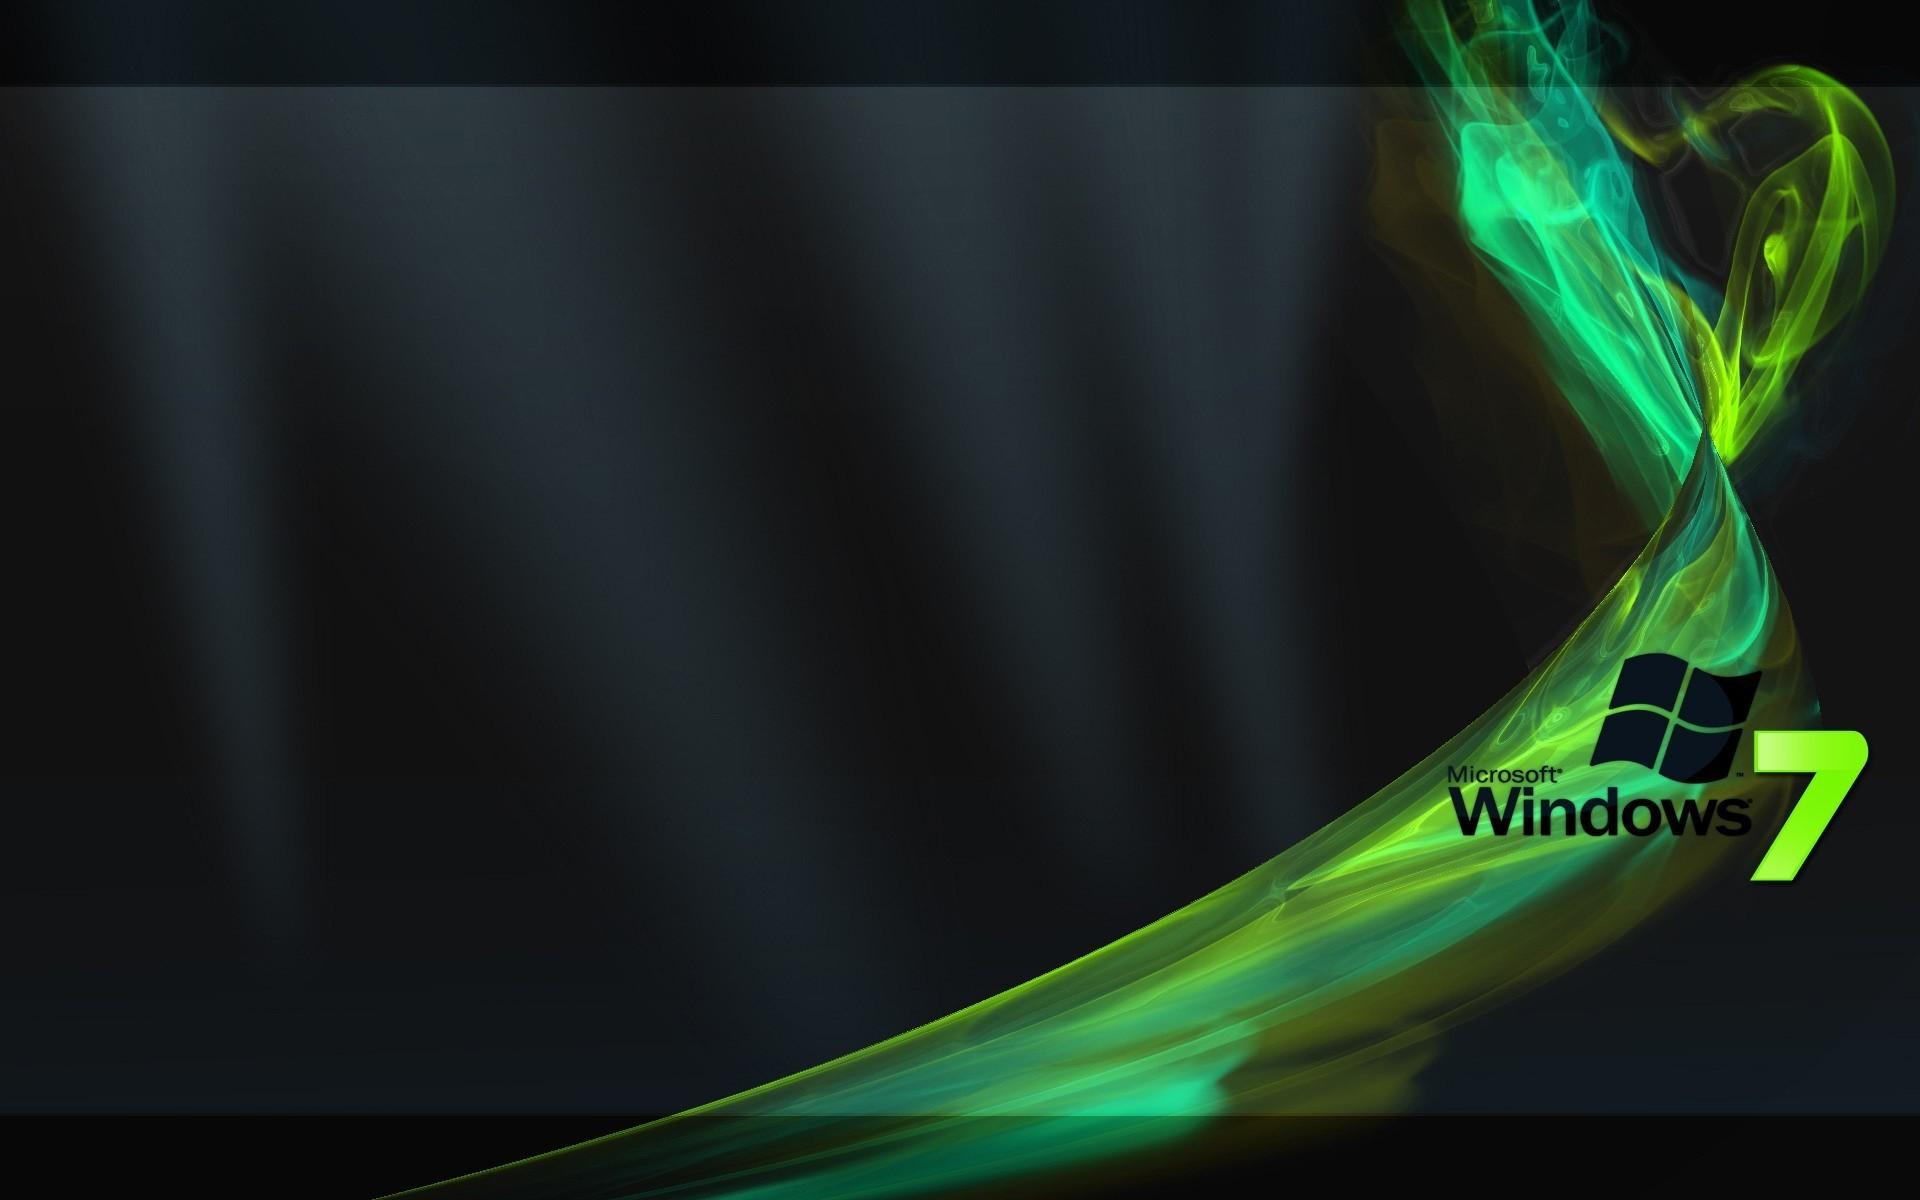 Windows 7 free desktop wallpapers wallpapersafari.